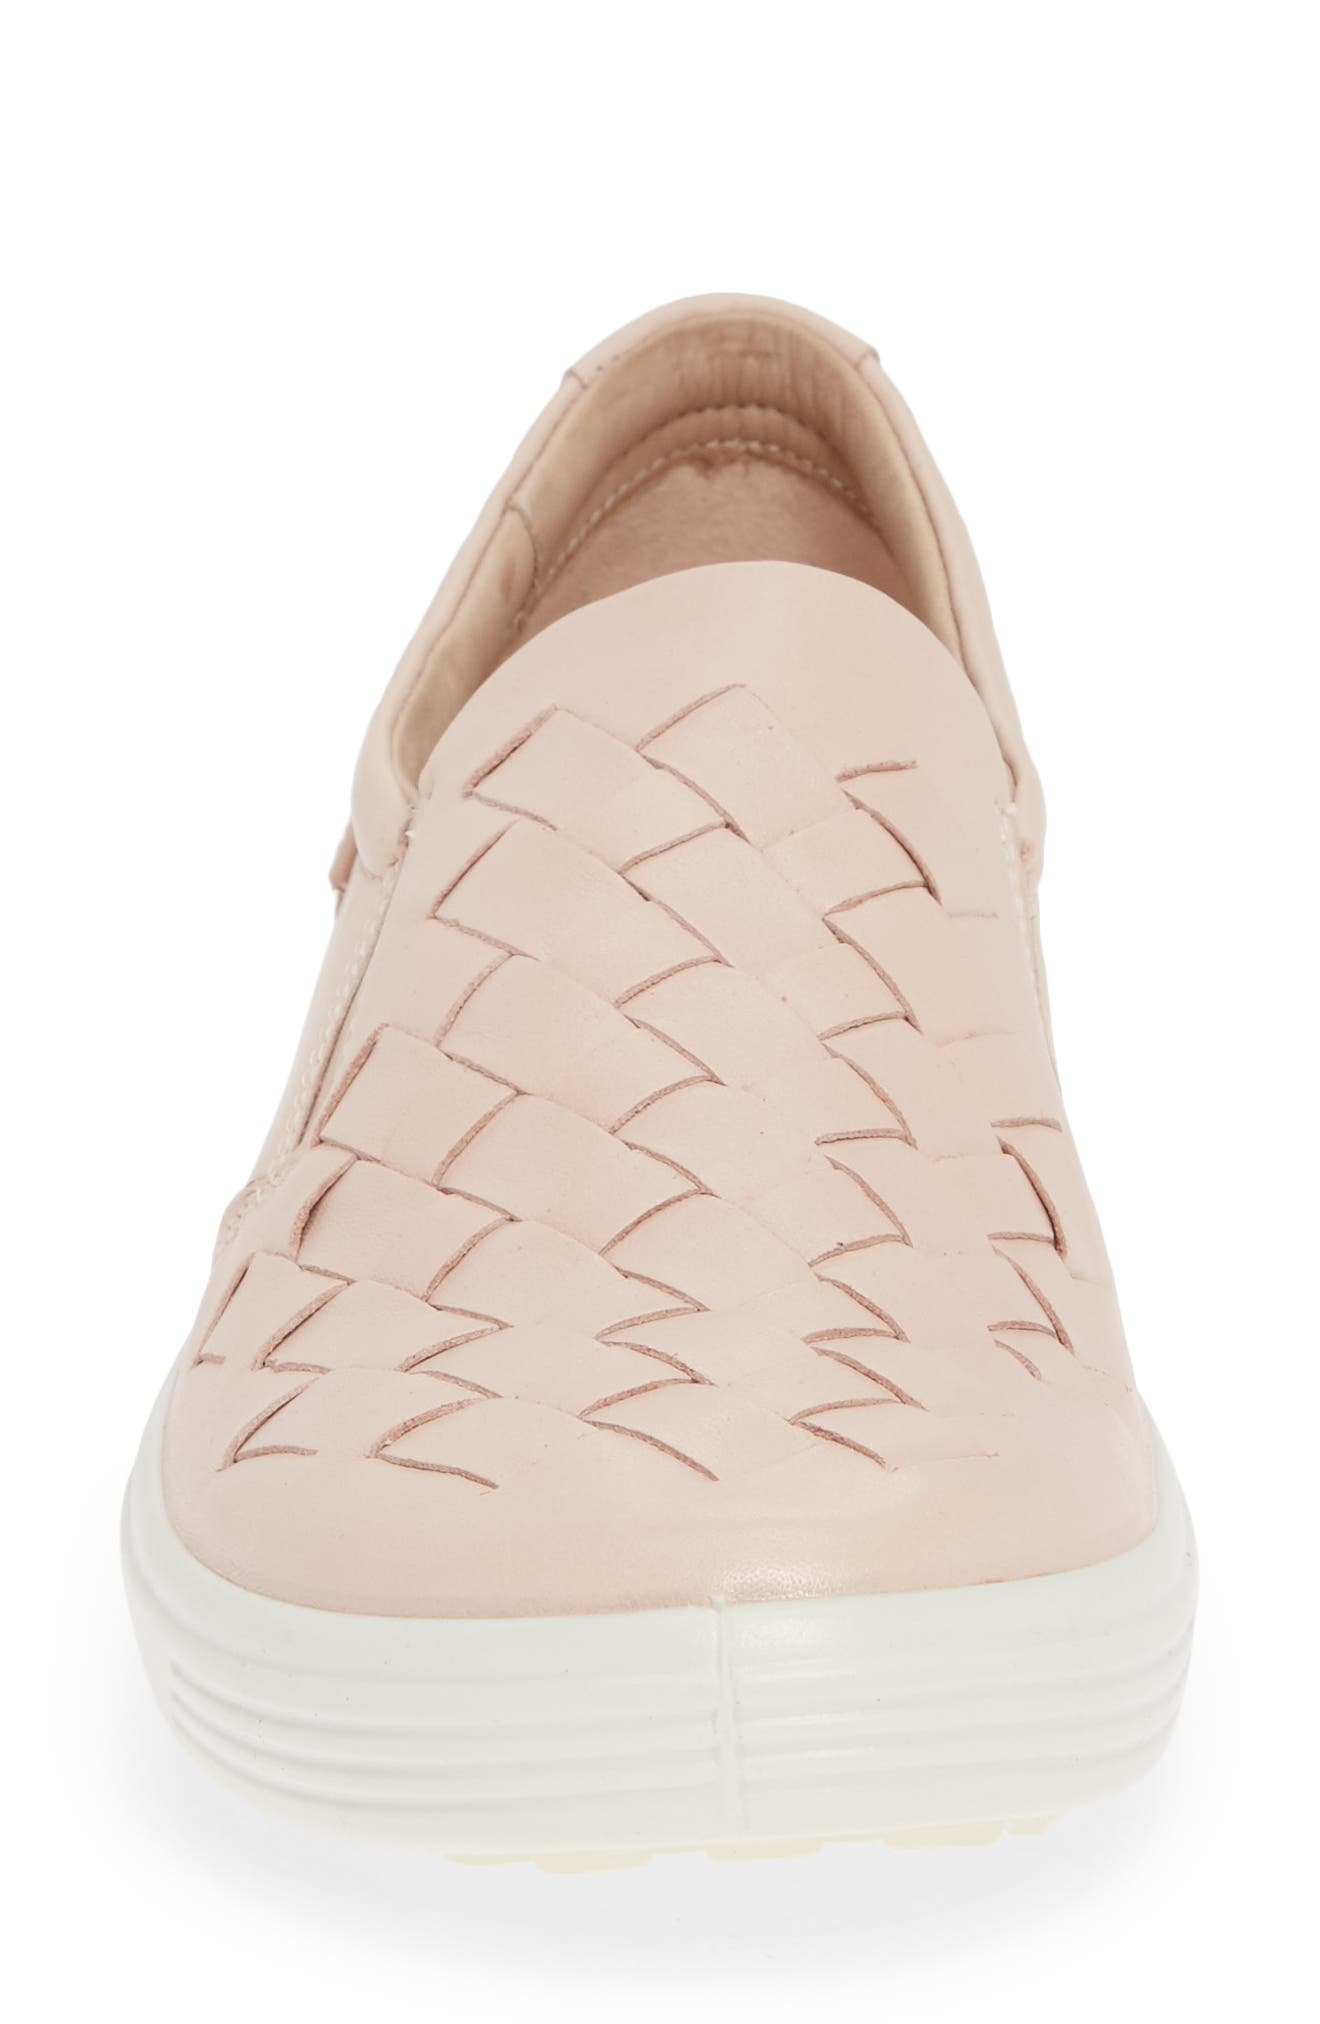 ECCO, Soft 7 Woven Slip-On Sneaker, Alternate thumbnail 4, color, ROSE DUST LEATHER